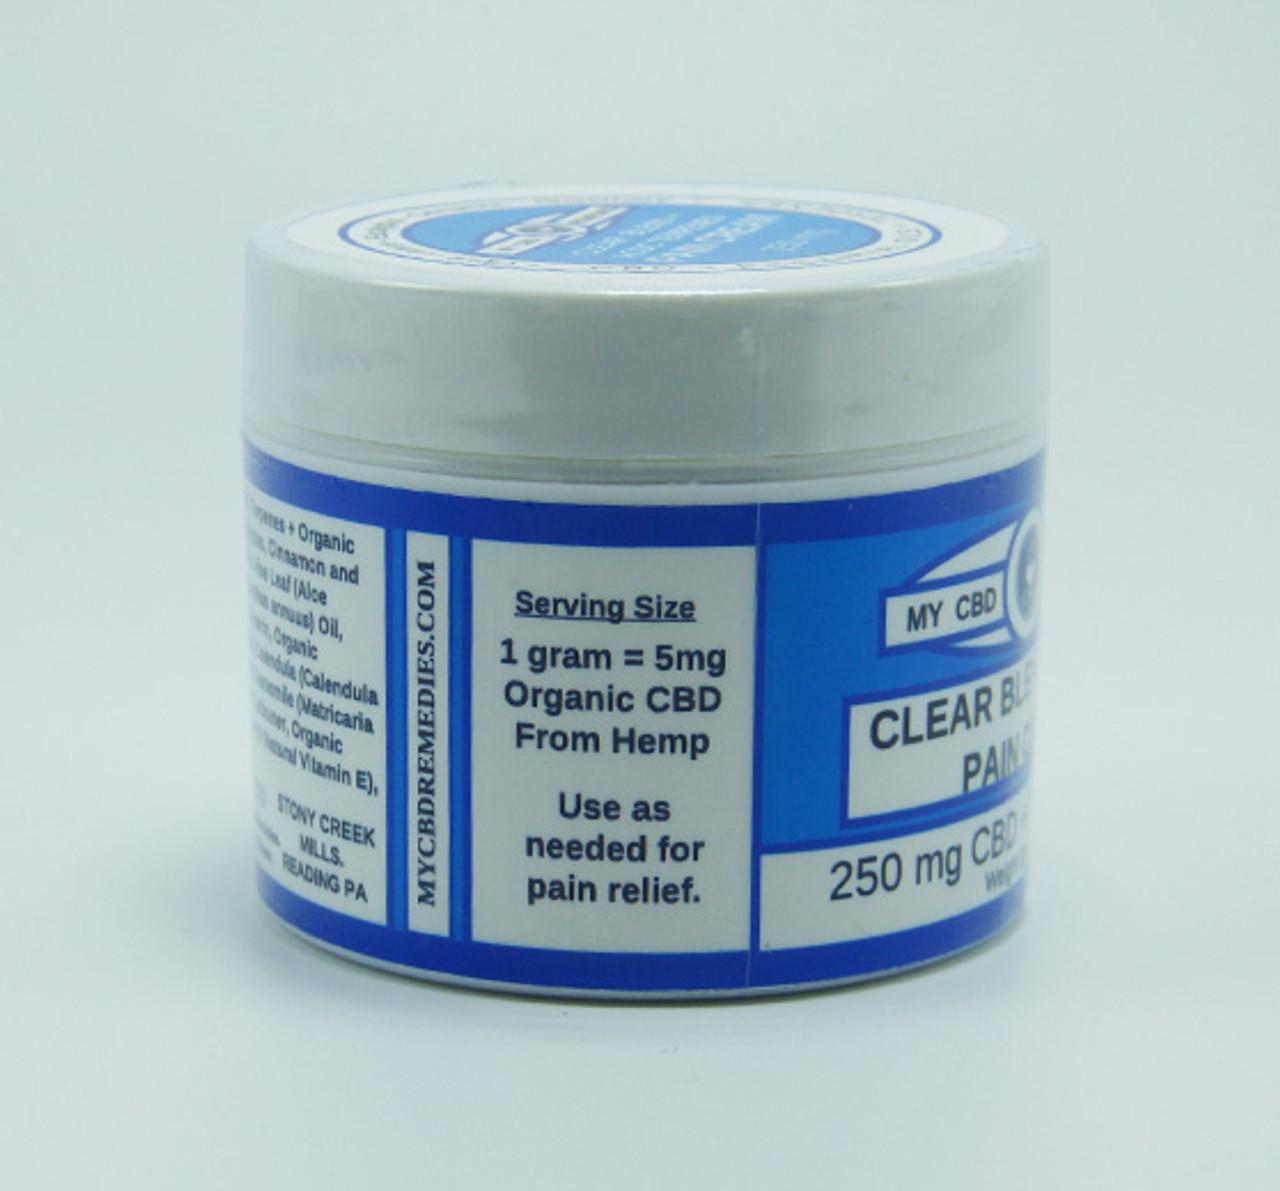 My CBD Remedies - Aromatherapy Pain Cream